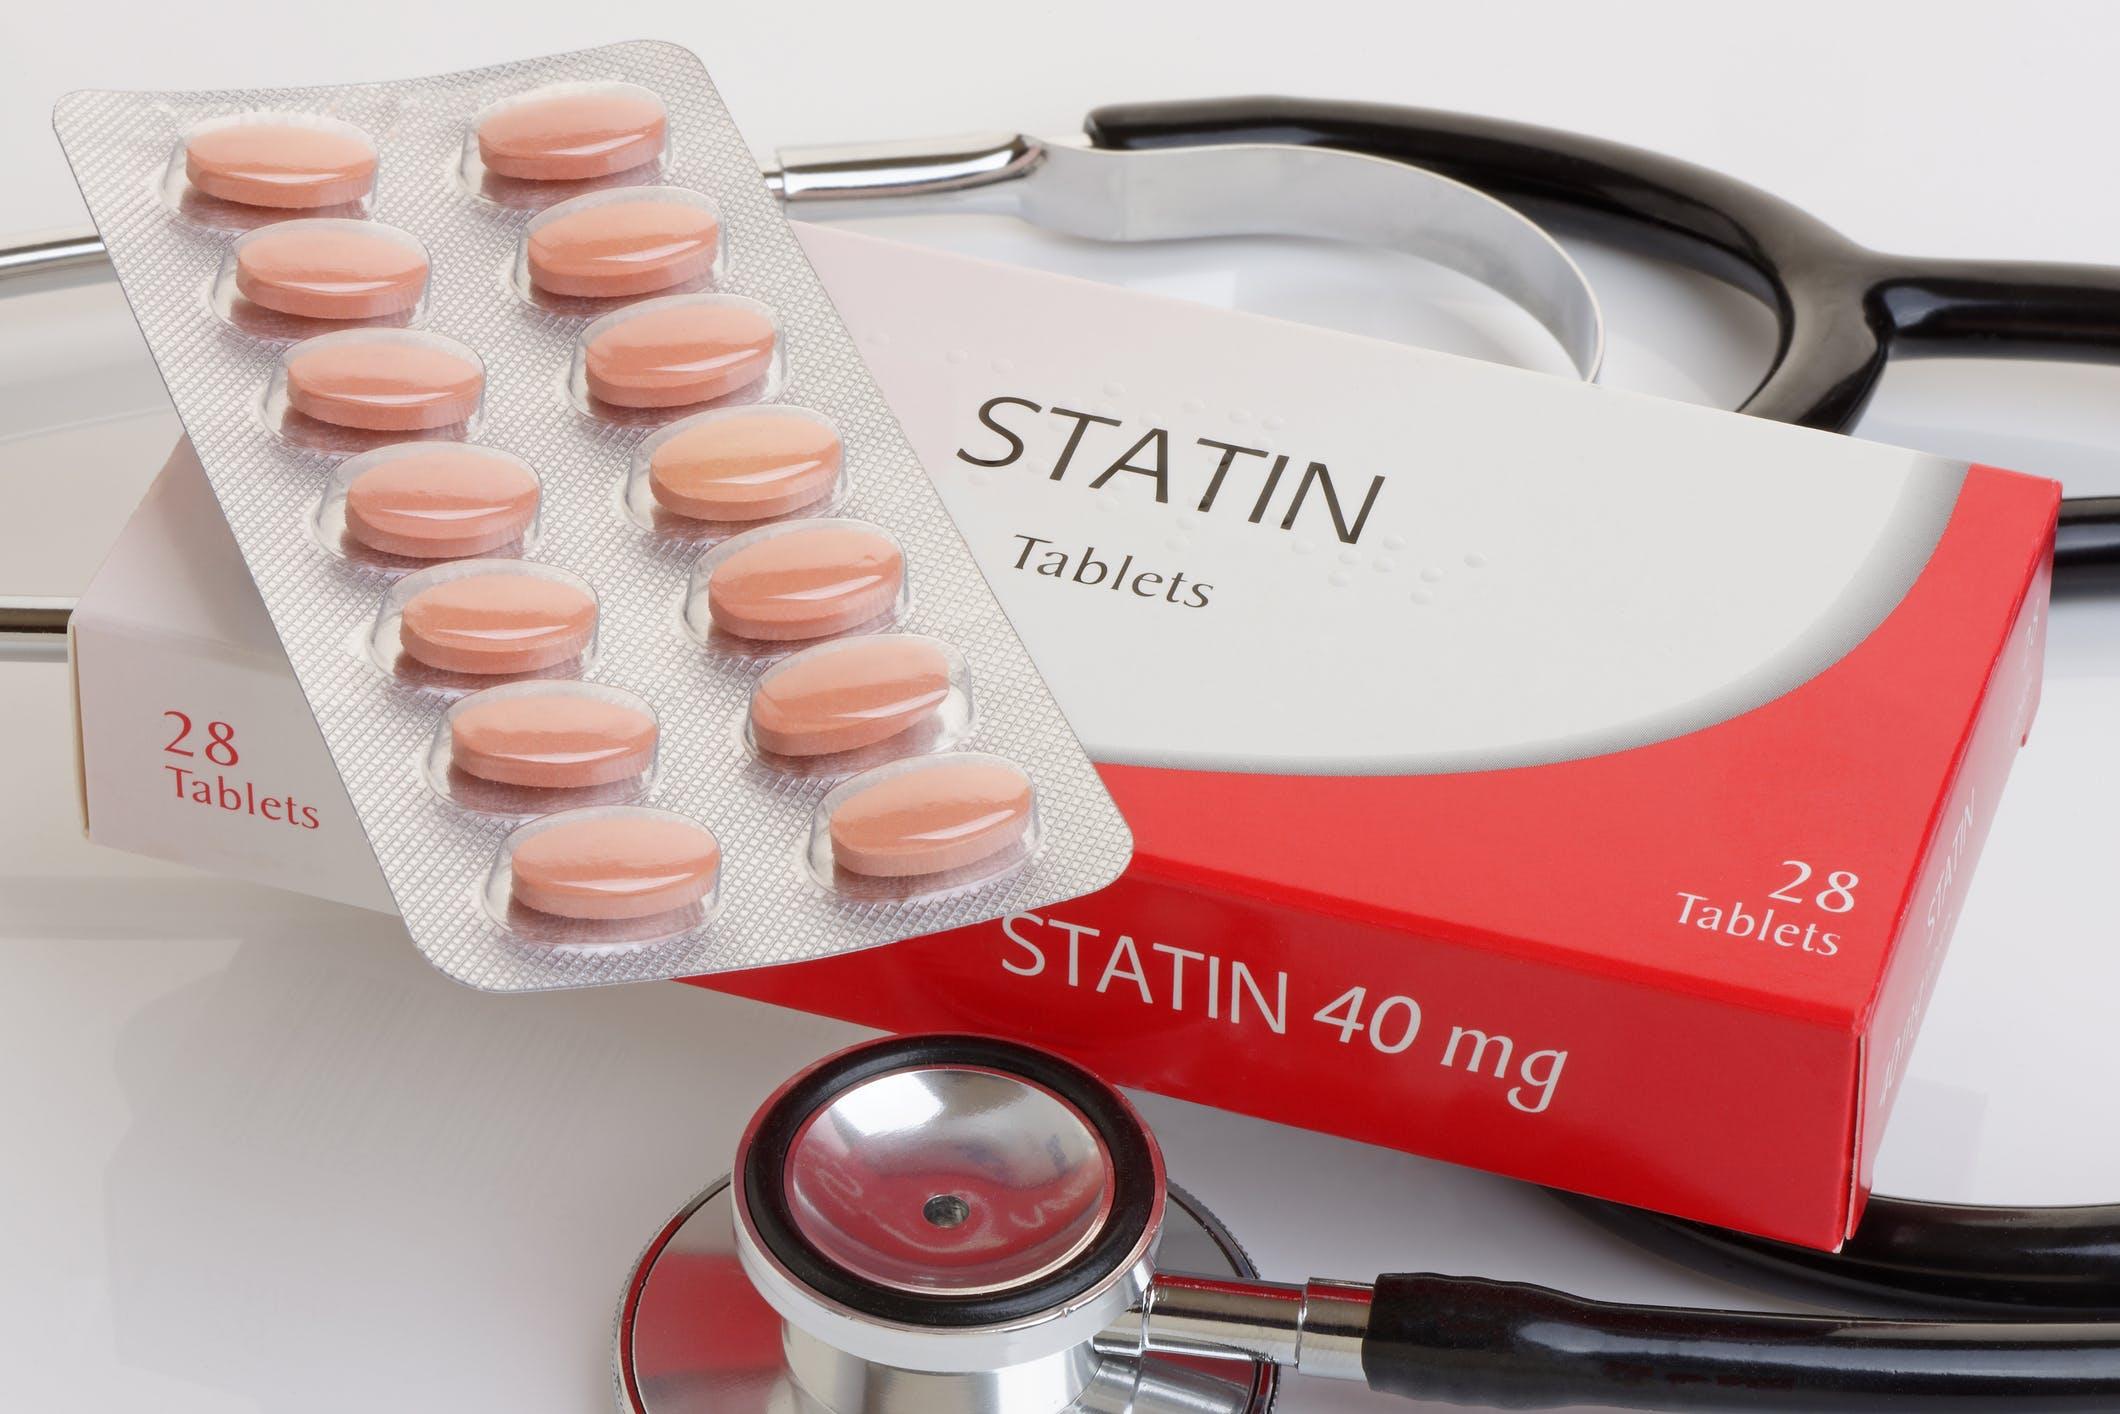 Generic Pack of Statins